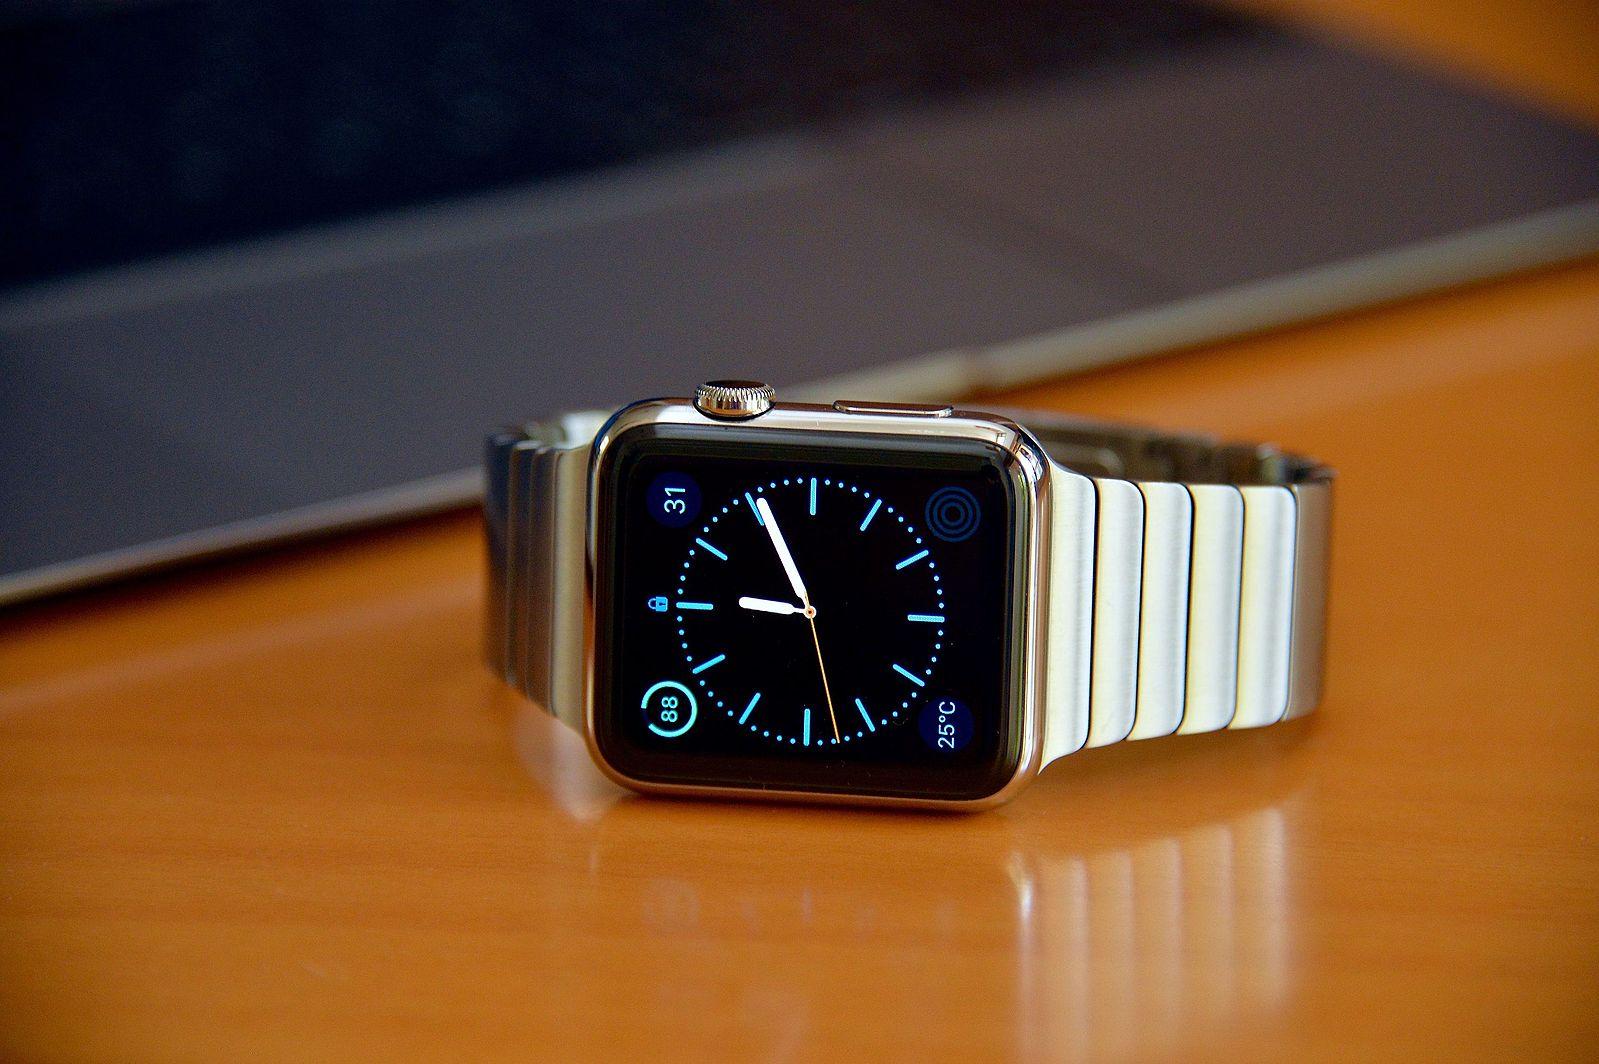 Apple Watch Face Support WatchOS 4.3.1